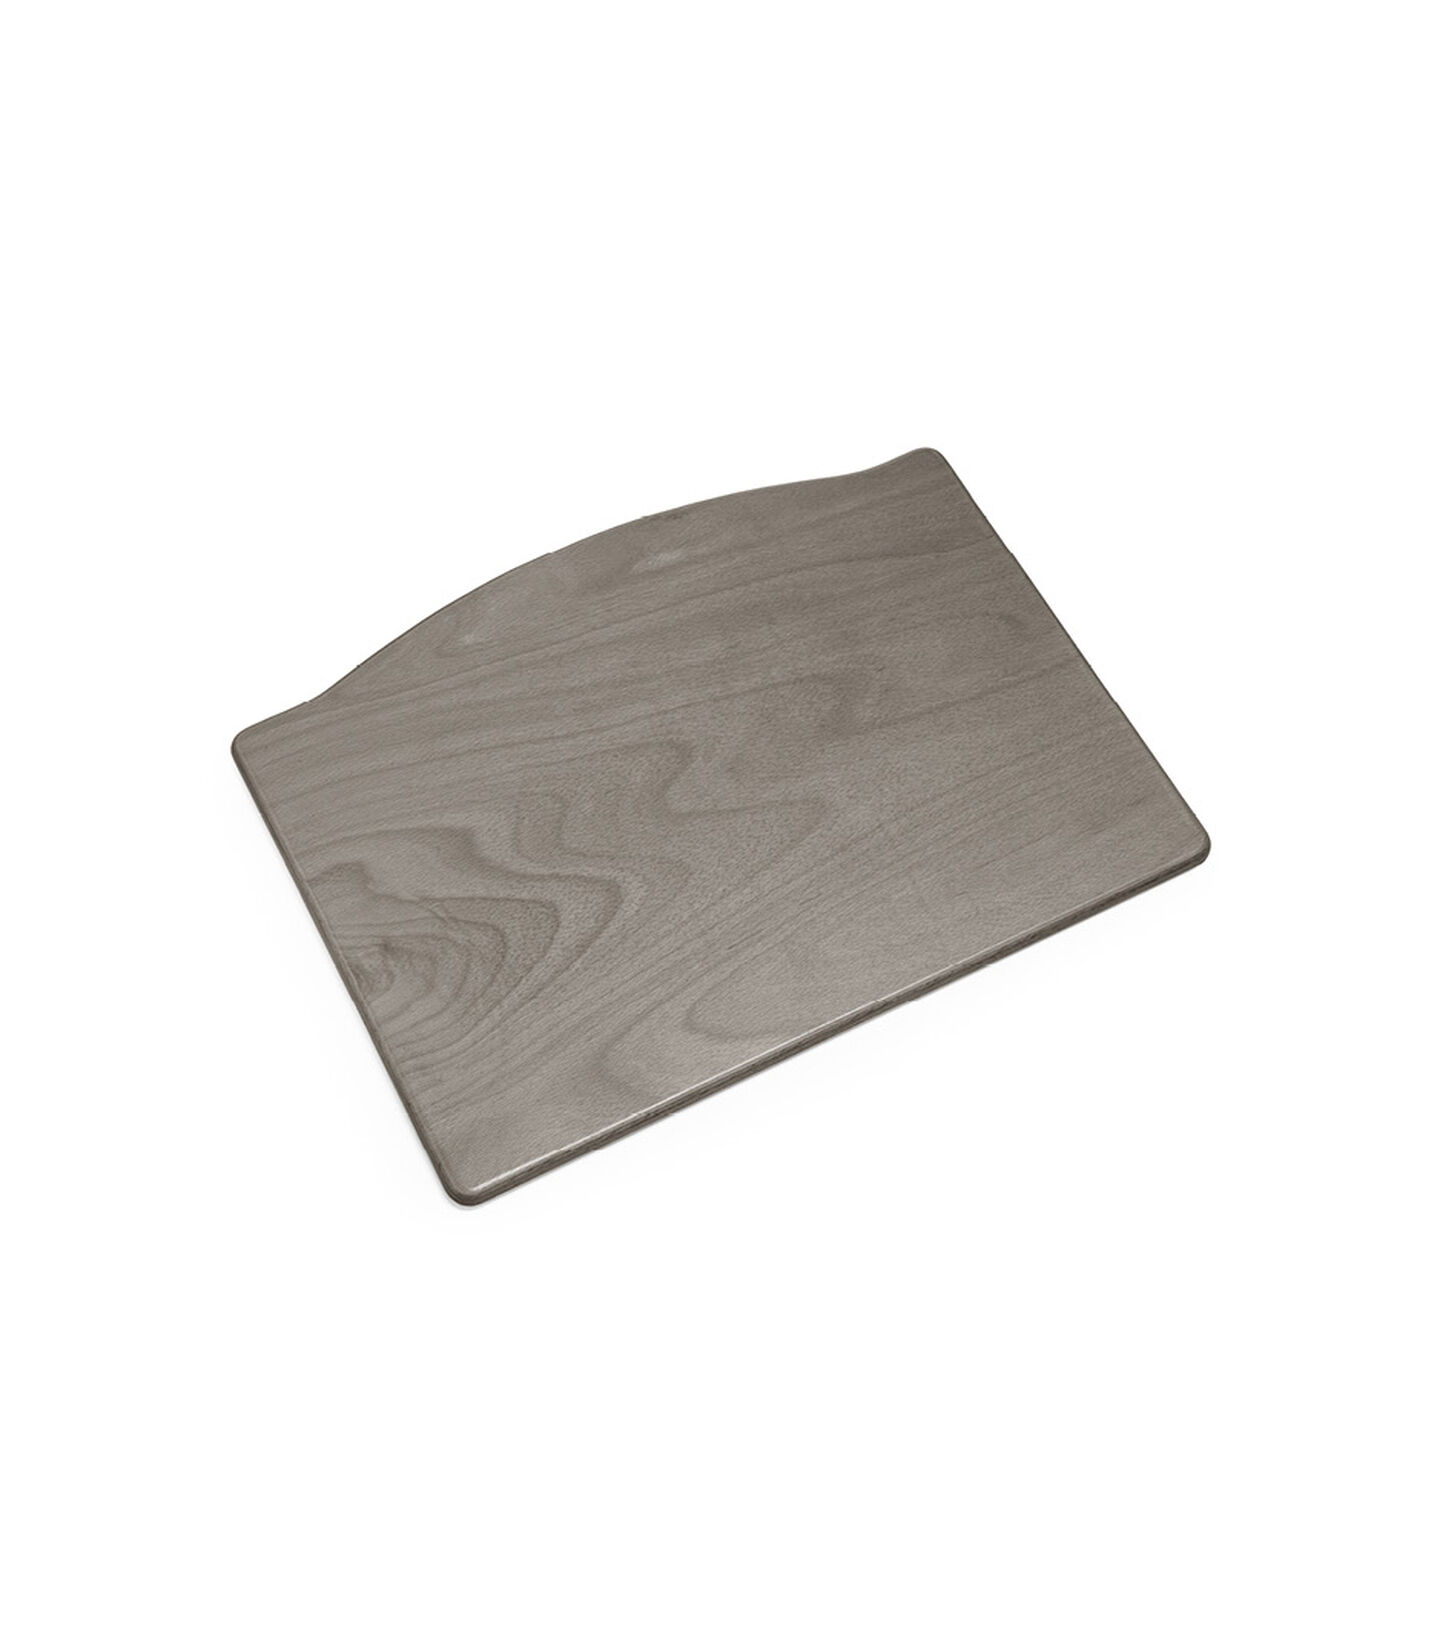 Tripp Trapp® Footplate Hazy Grey, Grigio Opaco, mainview view 2